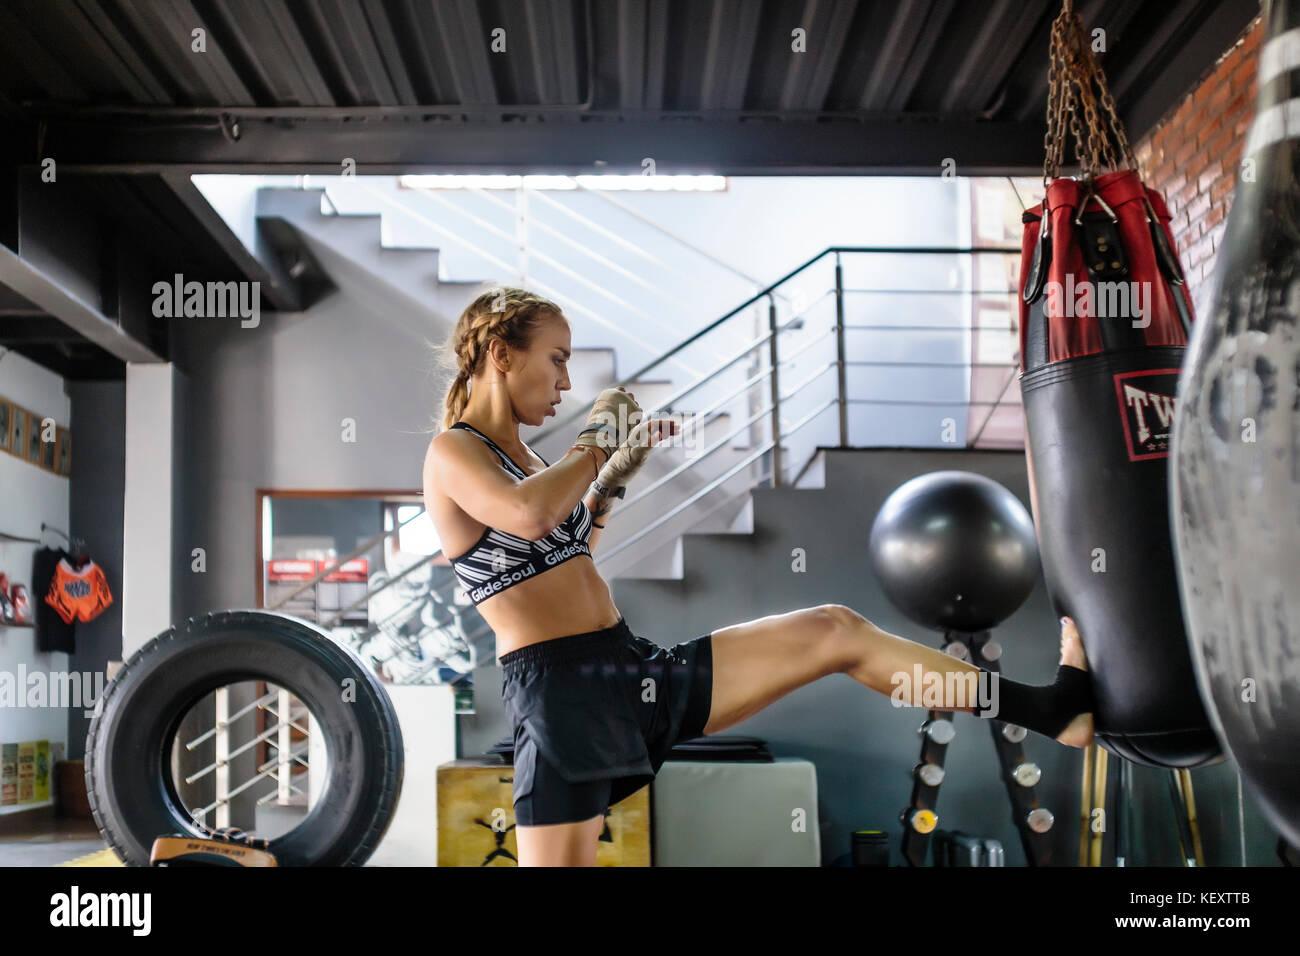 Side view photograph of female kickboxer kicking punching bag, Seminyak, Bali, Indonesia - Stock Image